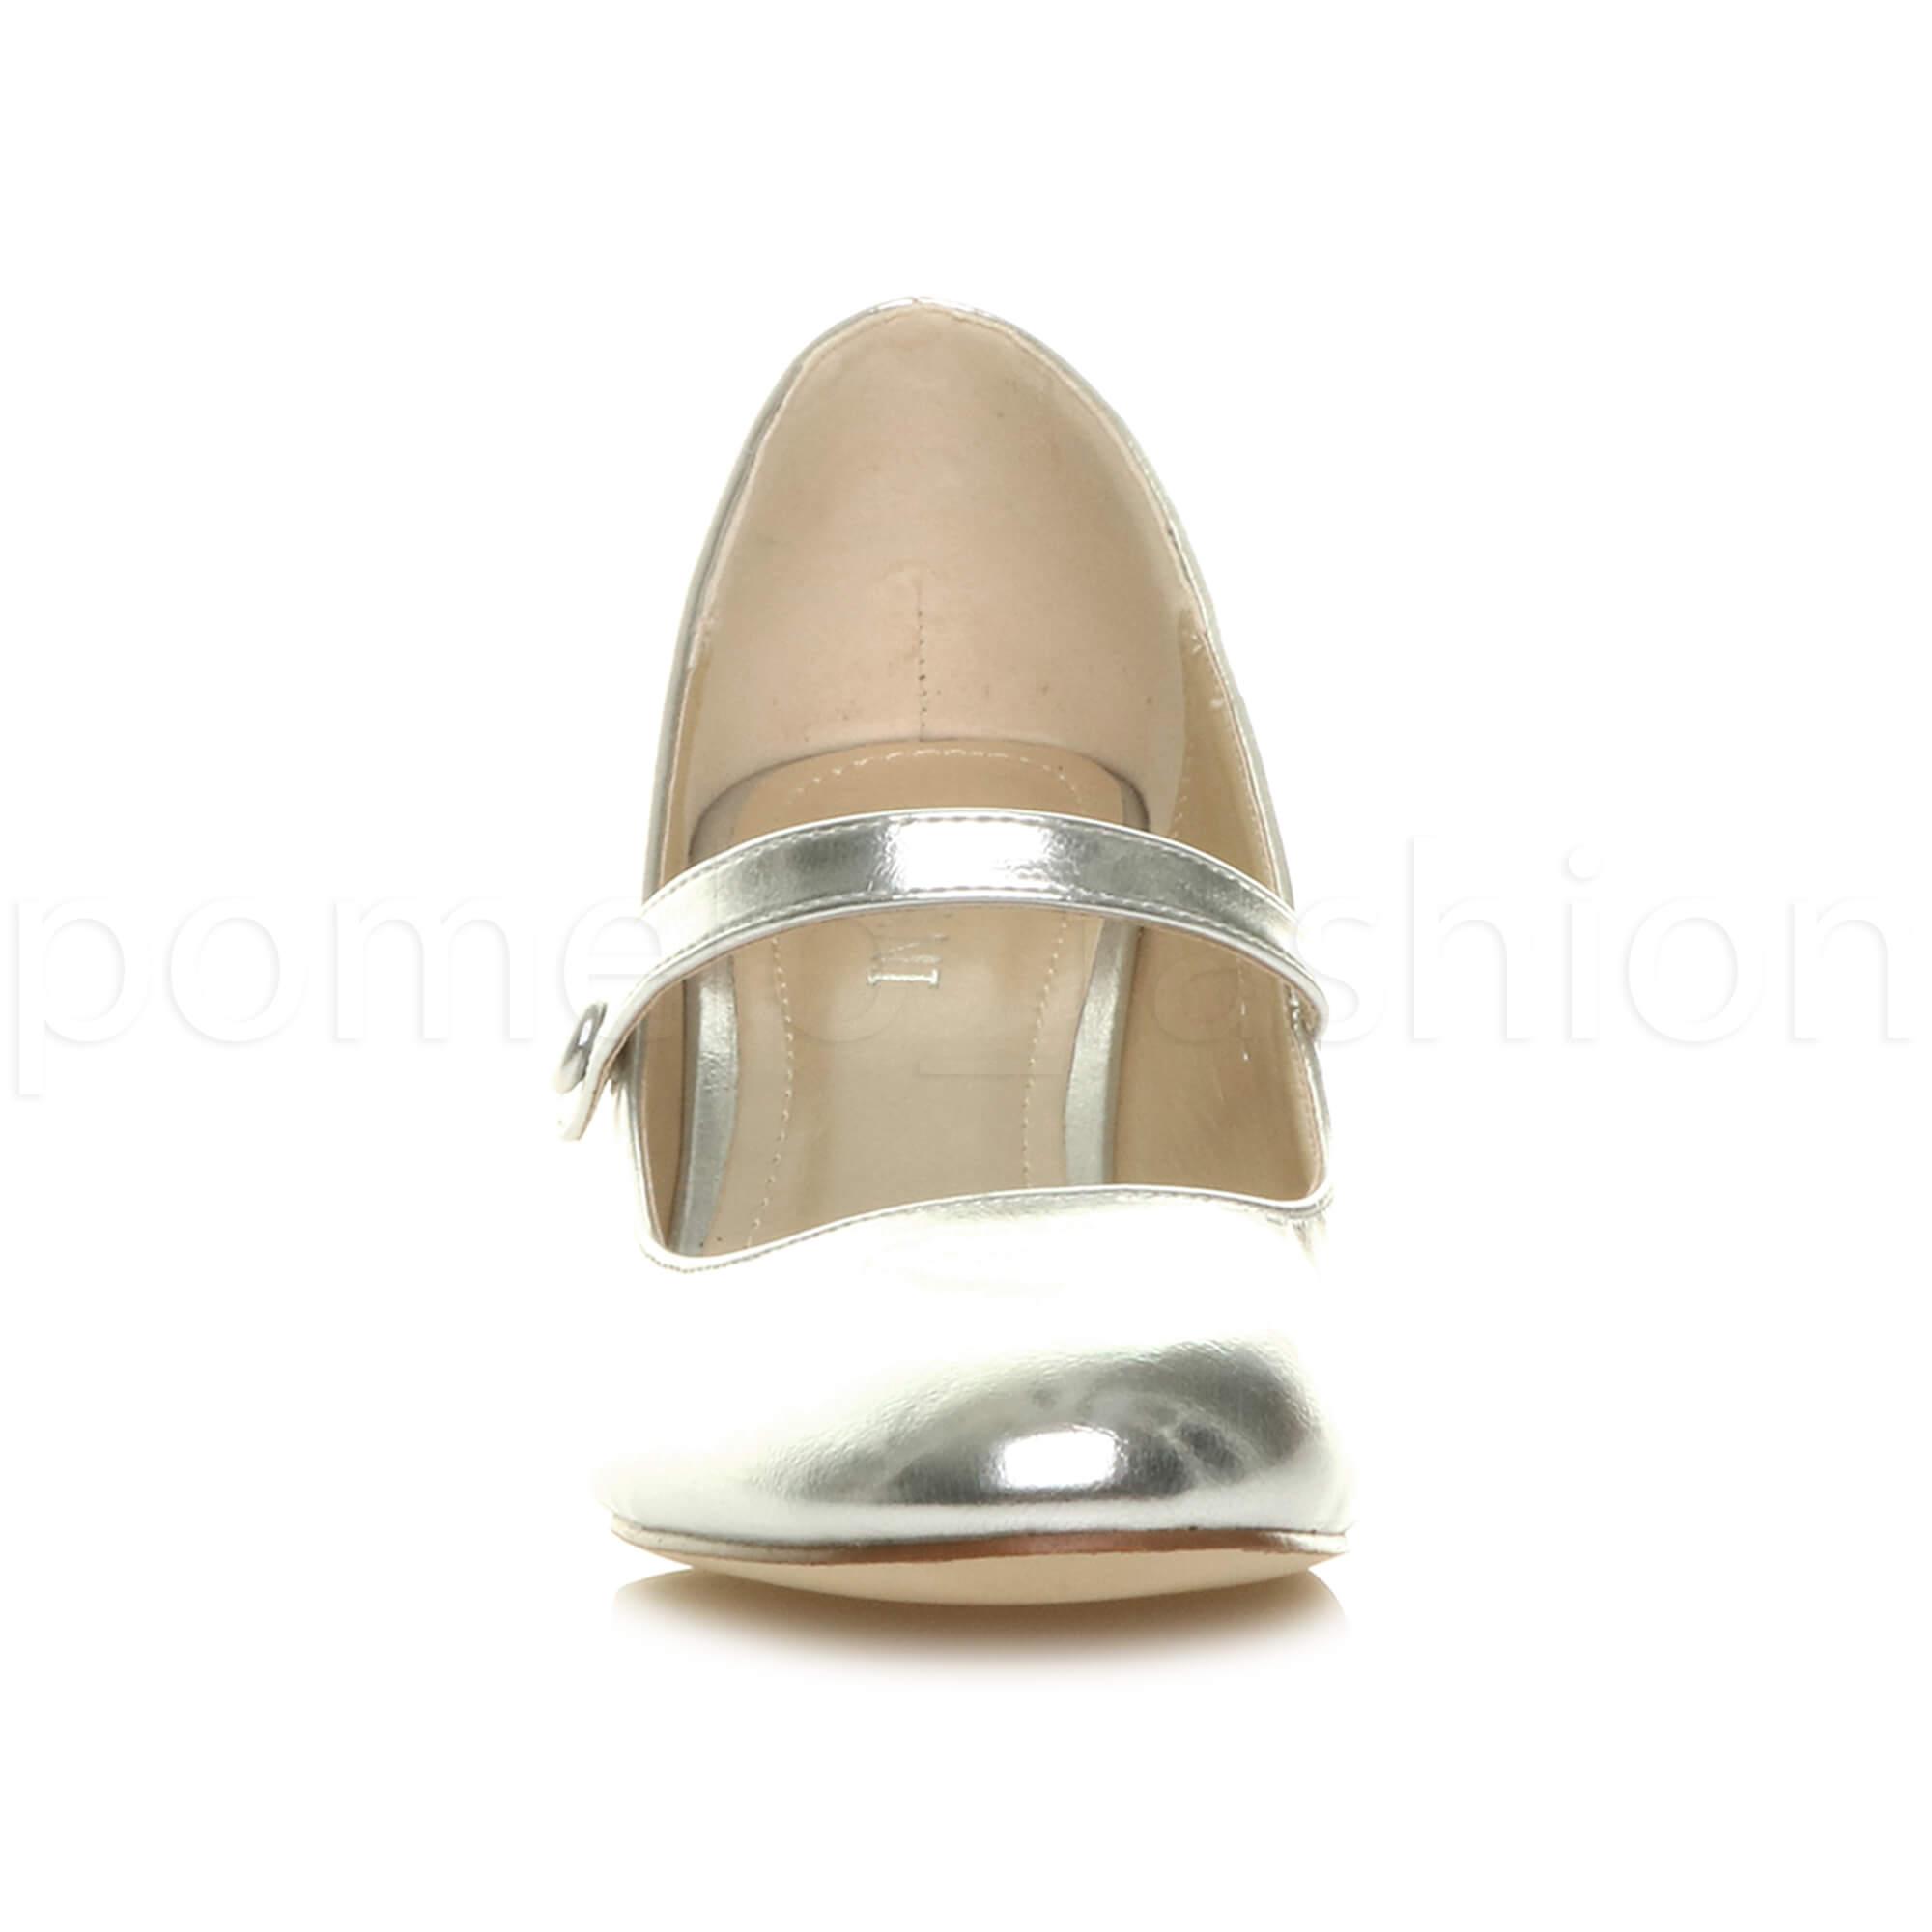 miniatura 153 - Donna basso tacco medio Mary Jane Damigella Matrimonio Pompe Scarpe Da Sera Taglia